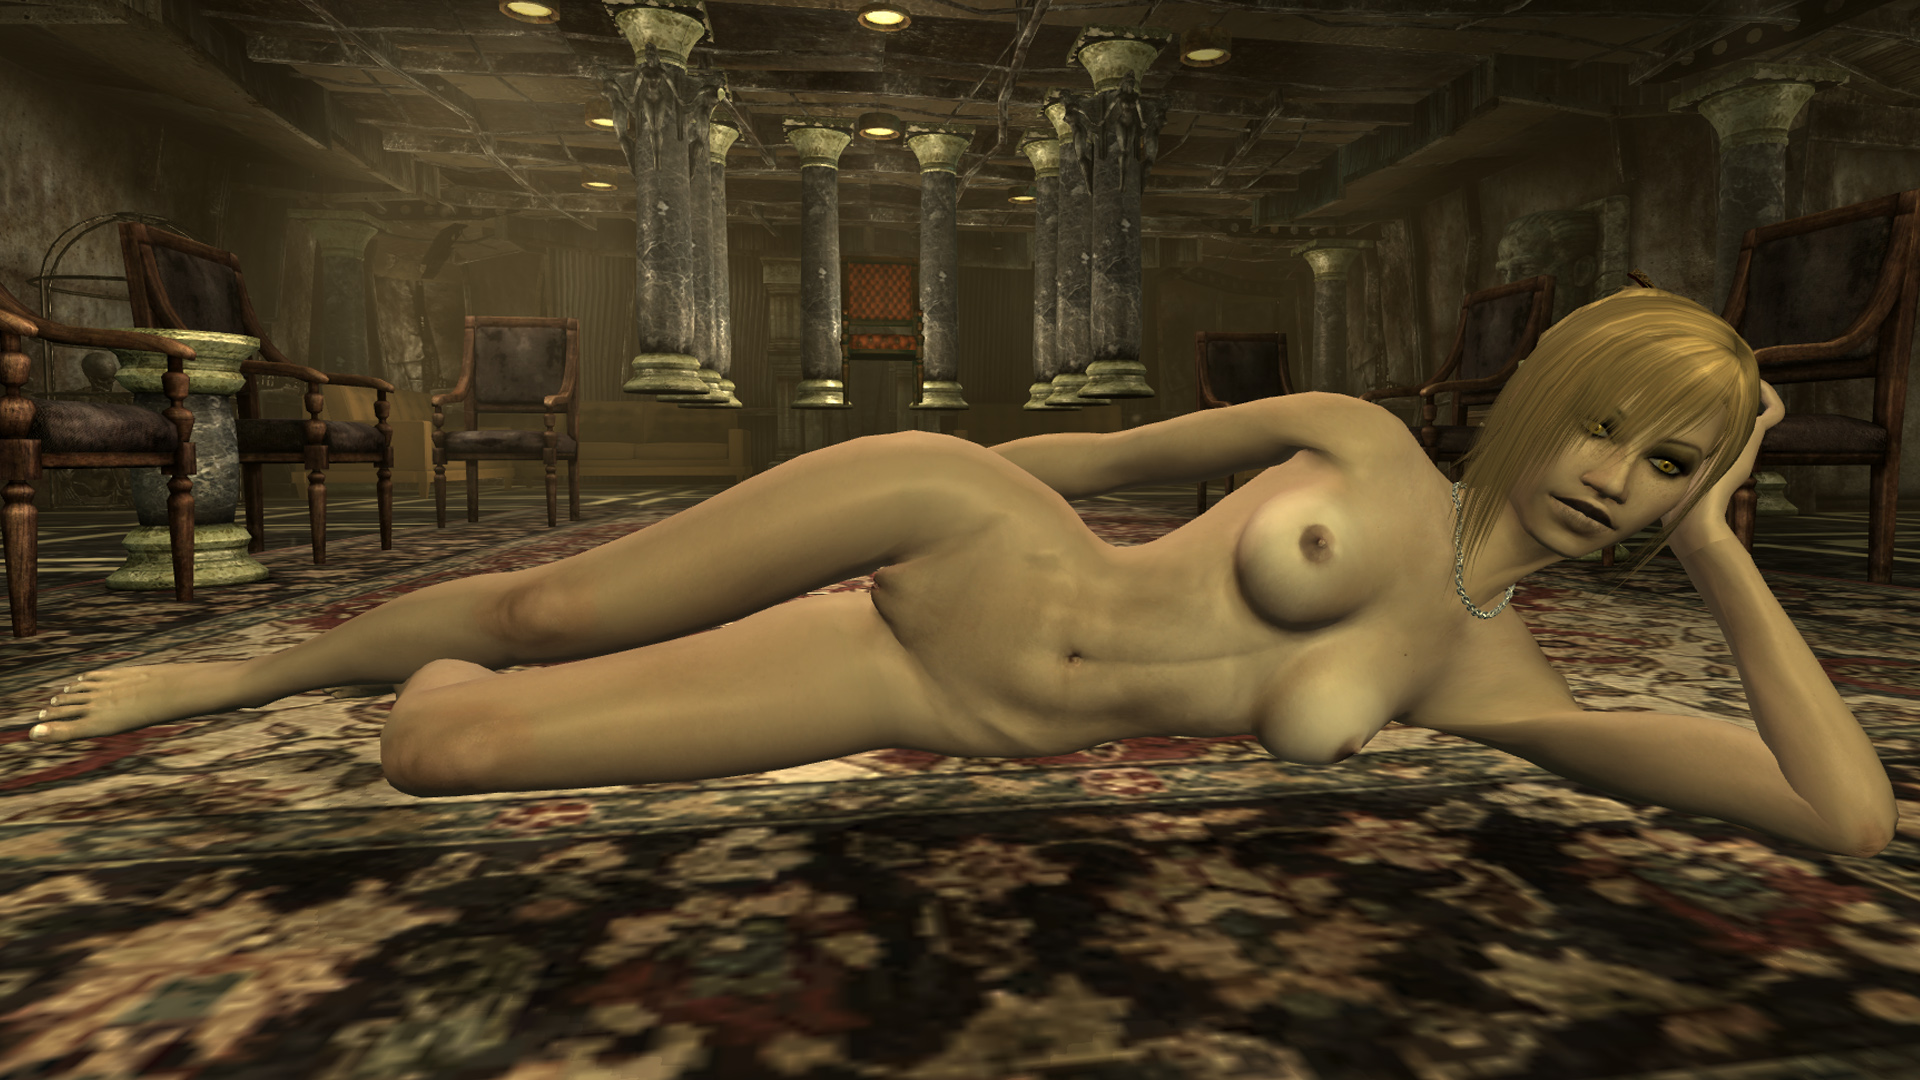 sims-4-seks-animatsiya